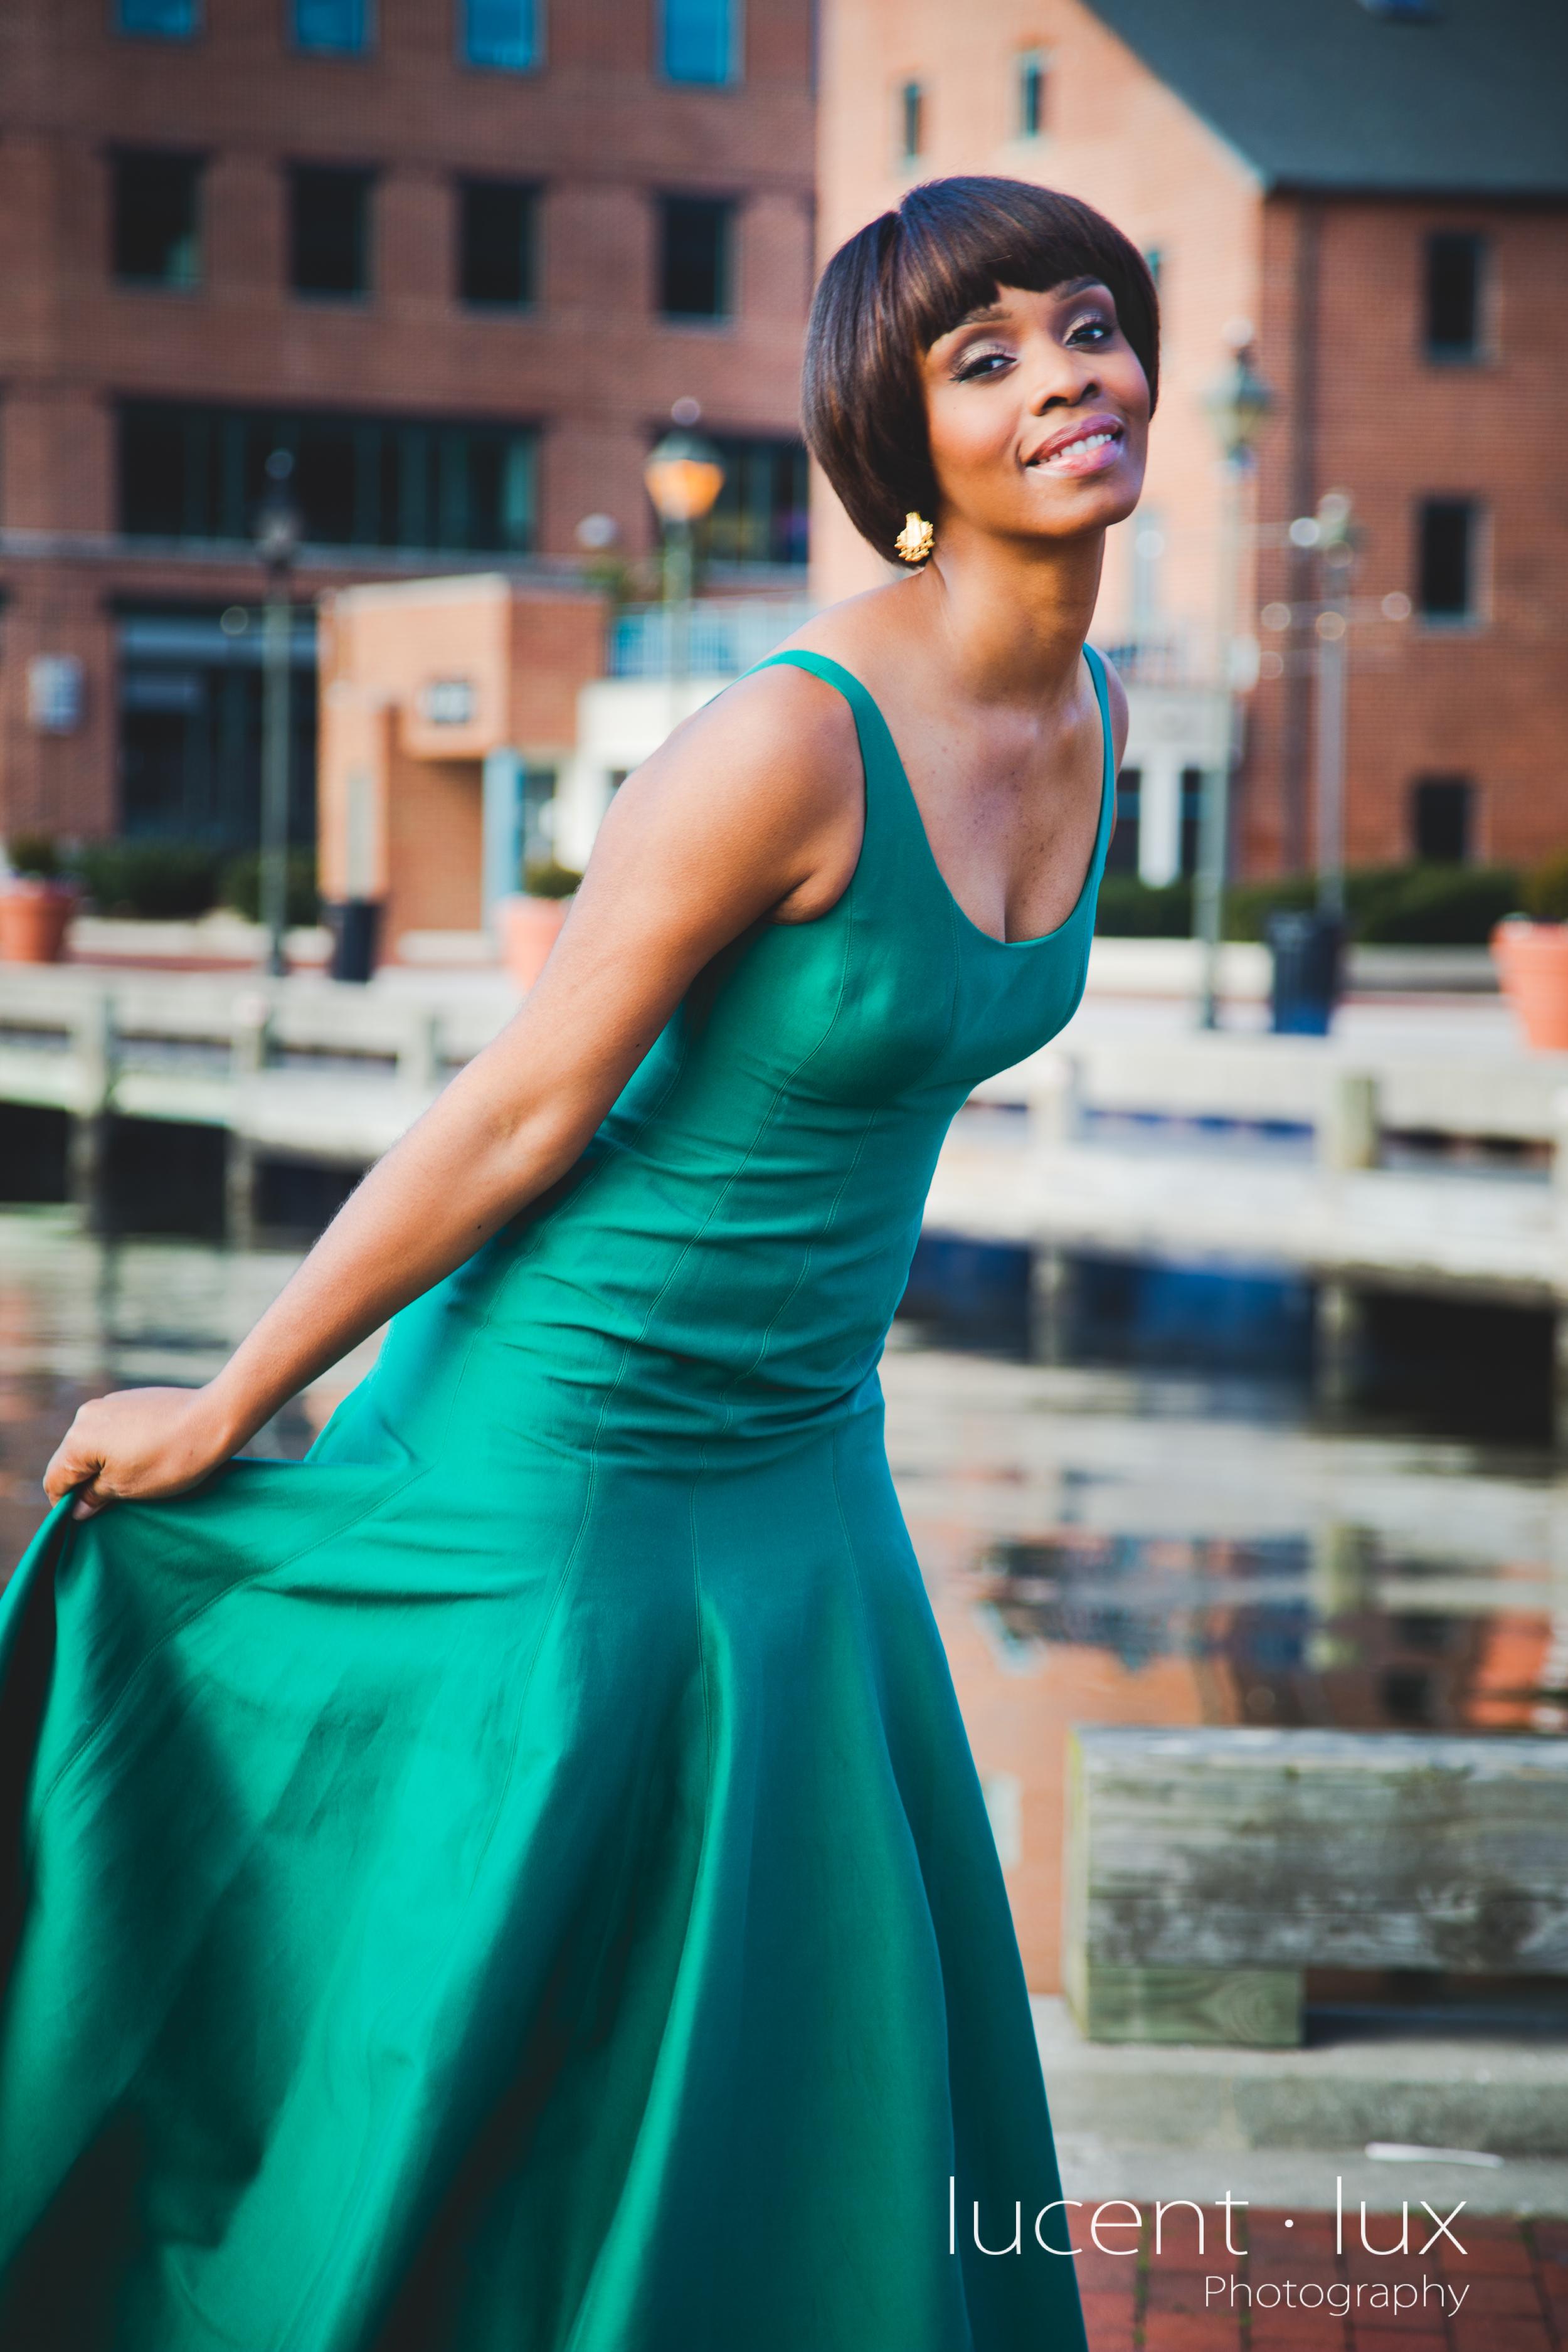 Fells-Point-Baltimore-Maryland-Photography-Photographer-Family-Portraits-Fells-Point-108.jpg